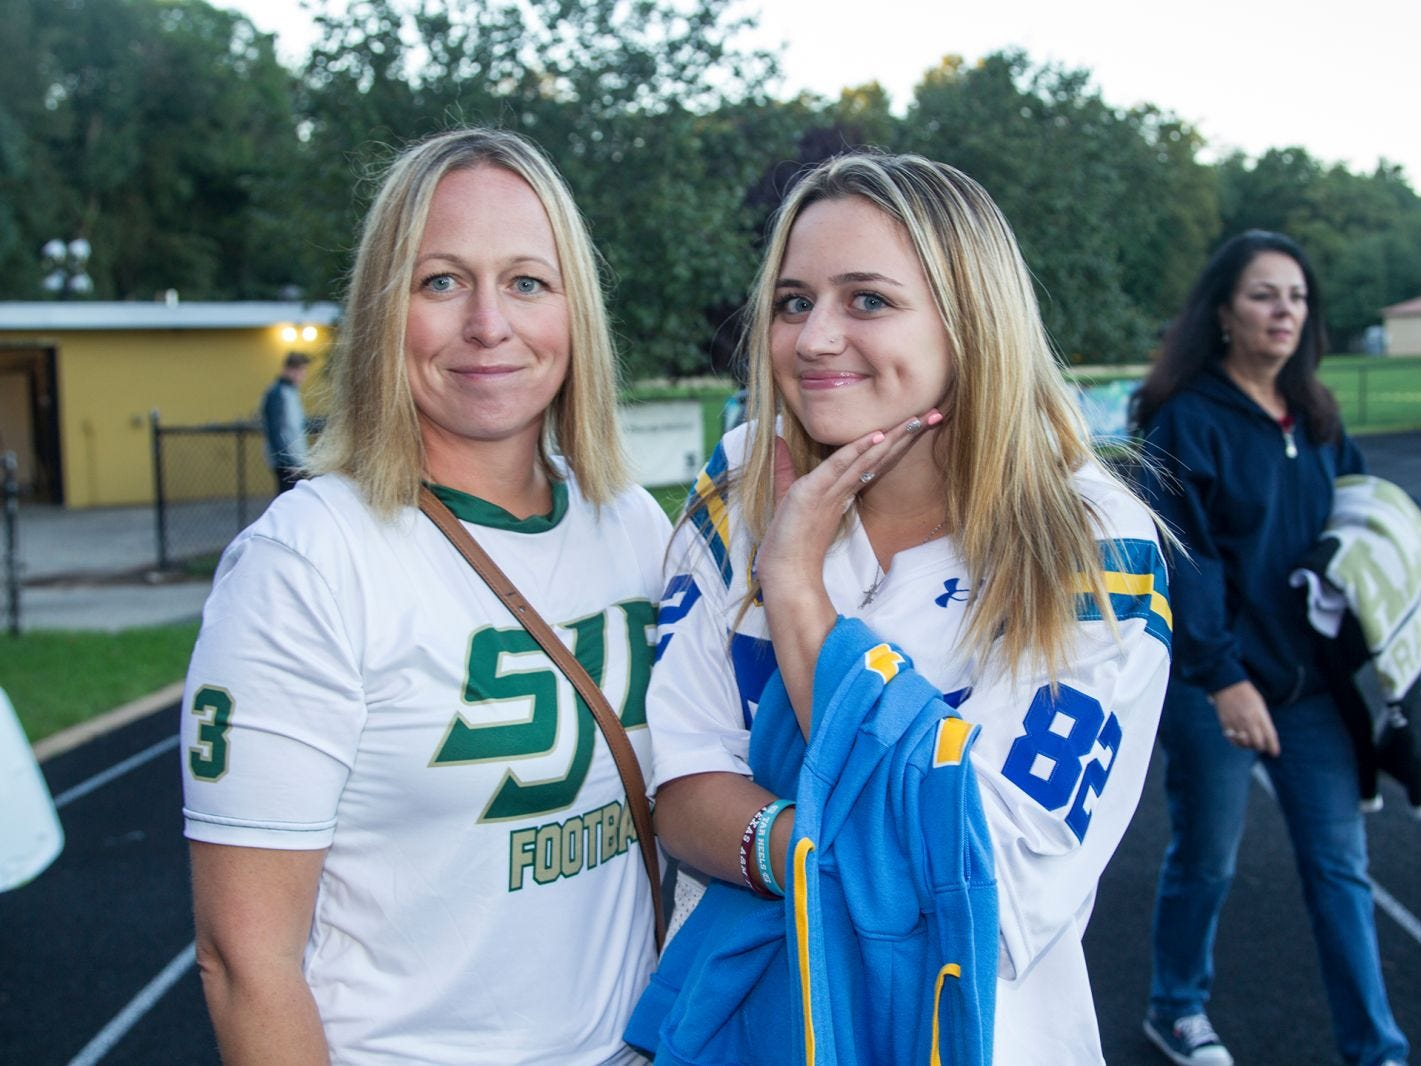 The scene at the 2018 St. Joseph Regional vs Paramus Catholic rivalry high school football game in Paramus. 09/28/2018